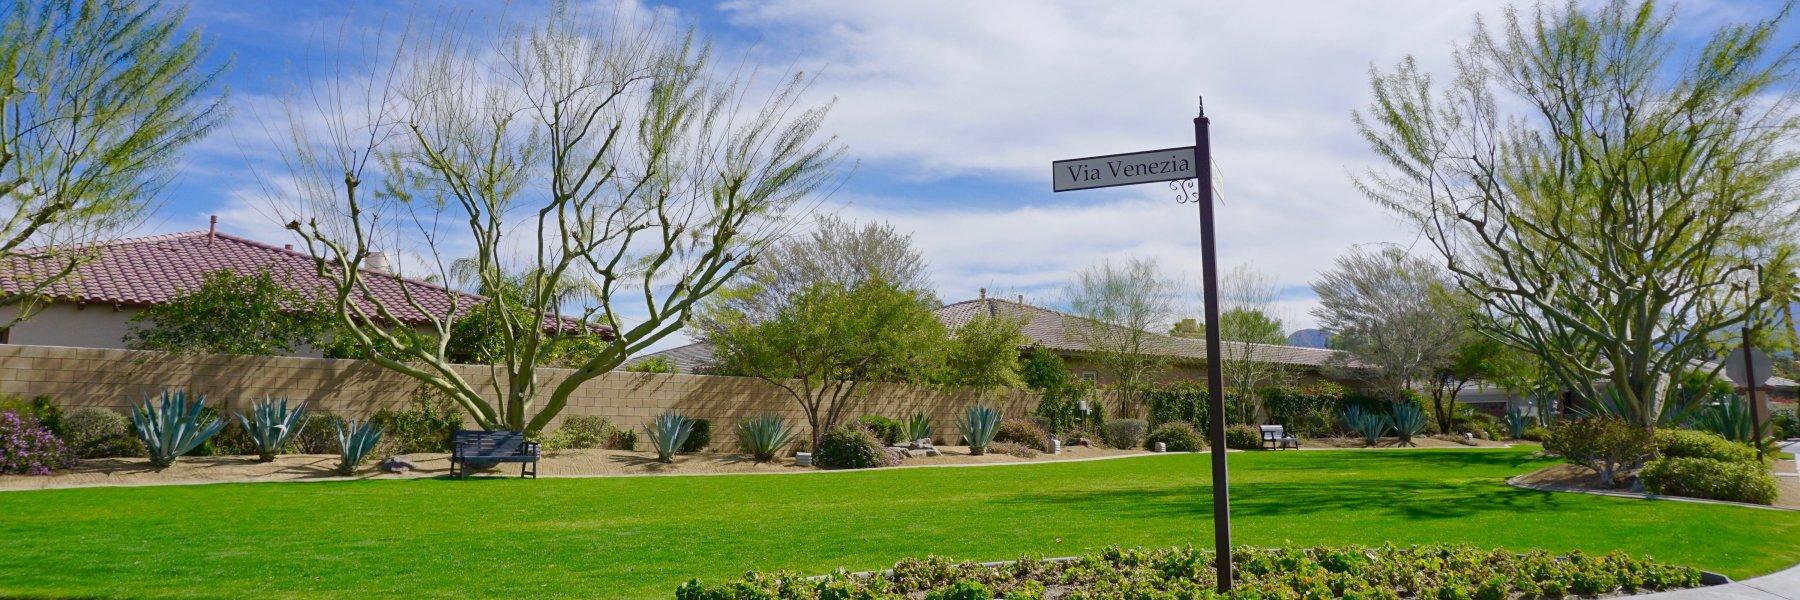 Venezia is a community of homes in Palm Desert California